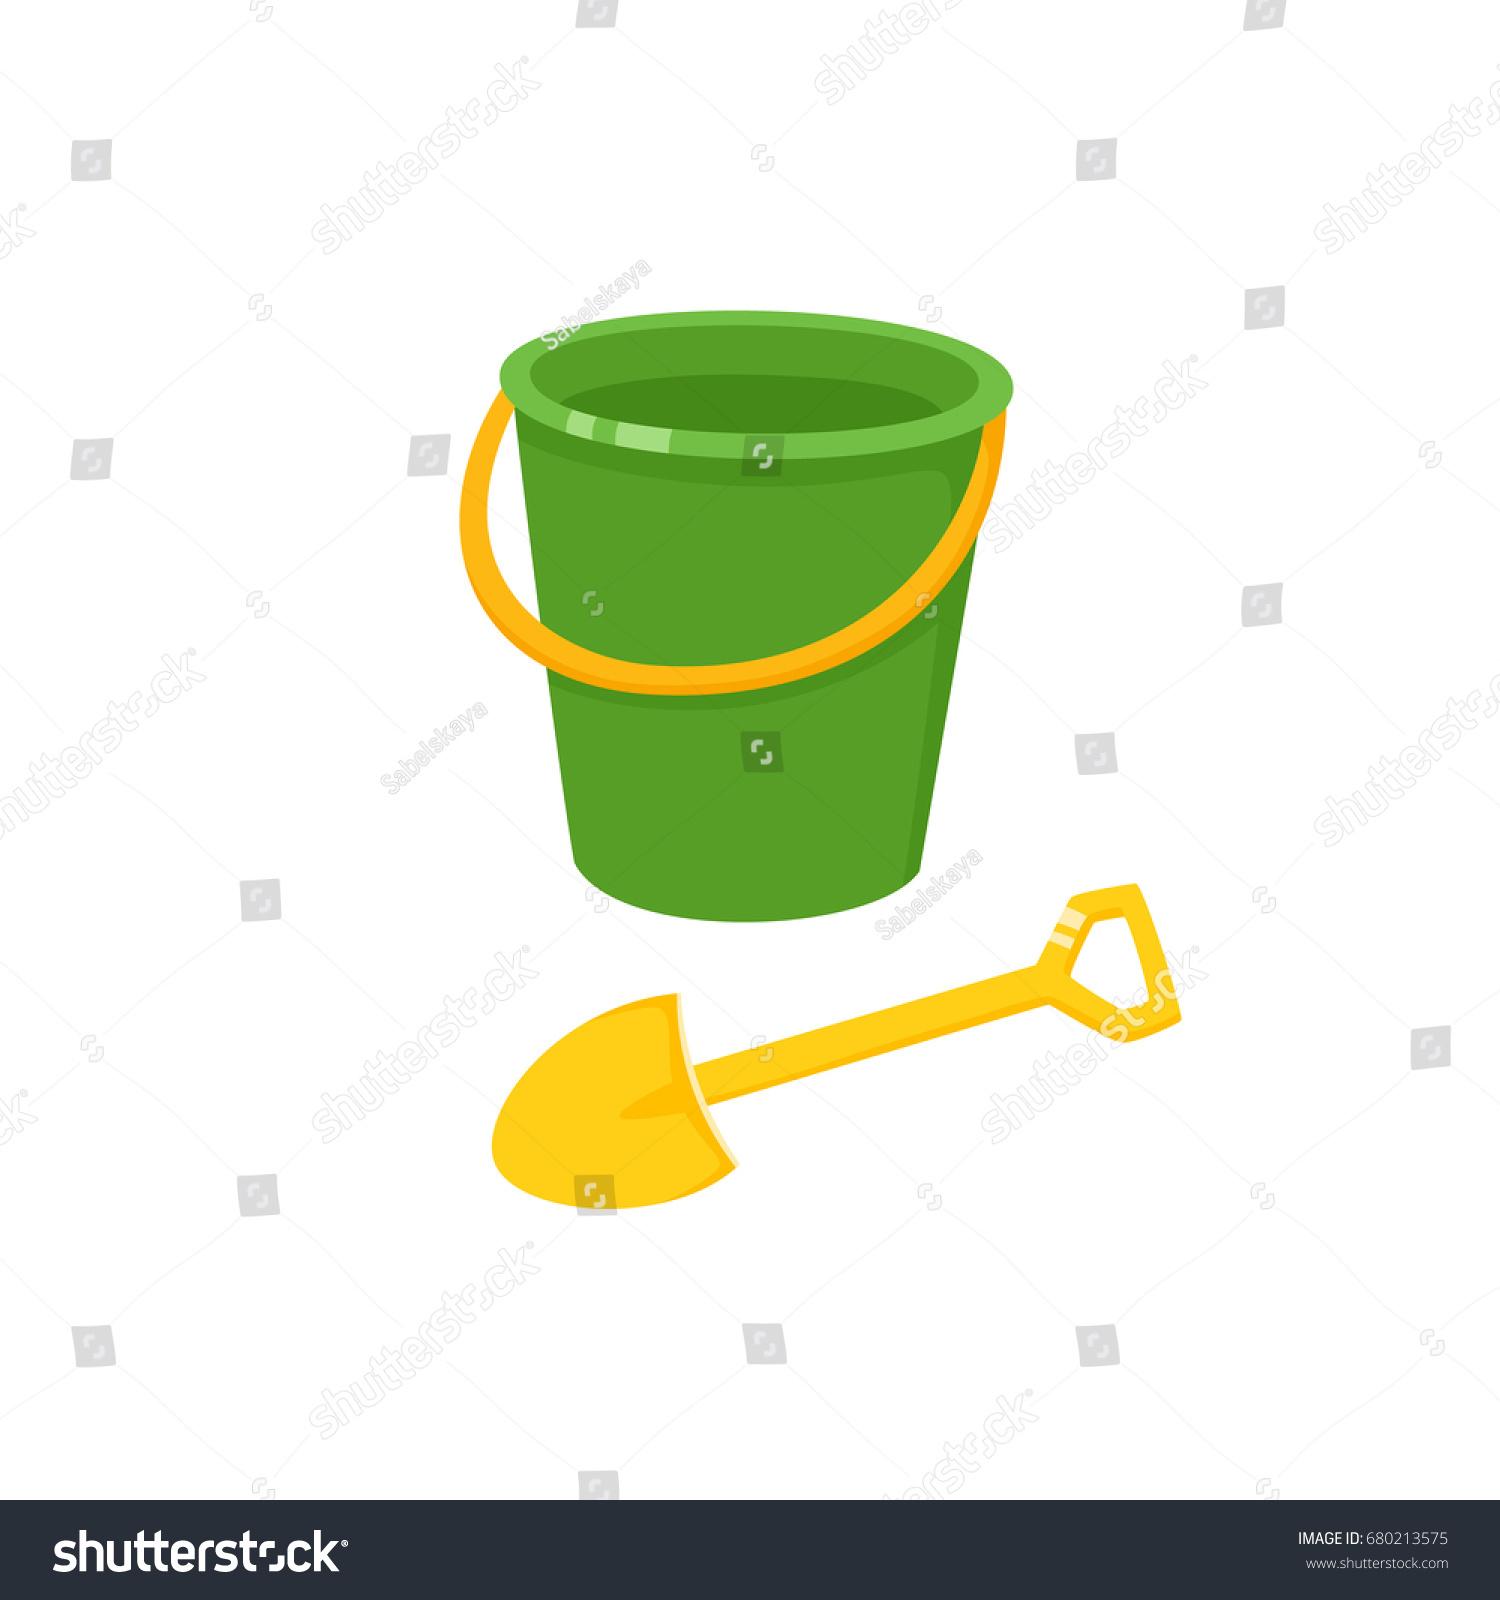 Uncategorized Toy Pail vector baby bucket sand shovel toy stock 680213575 and flat illustration child spade pail plastic